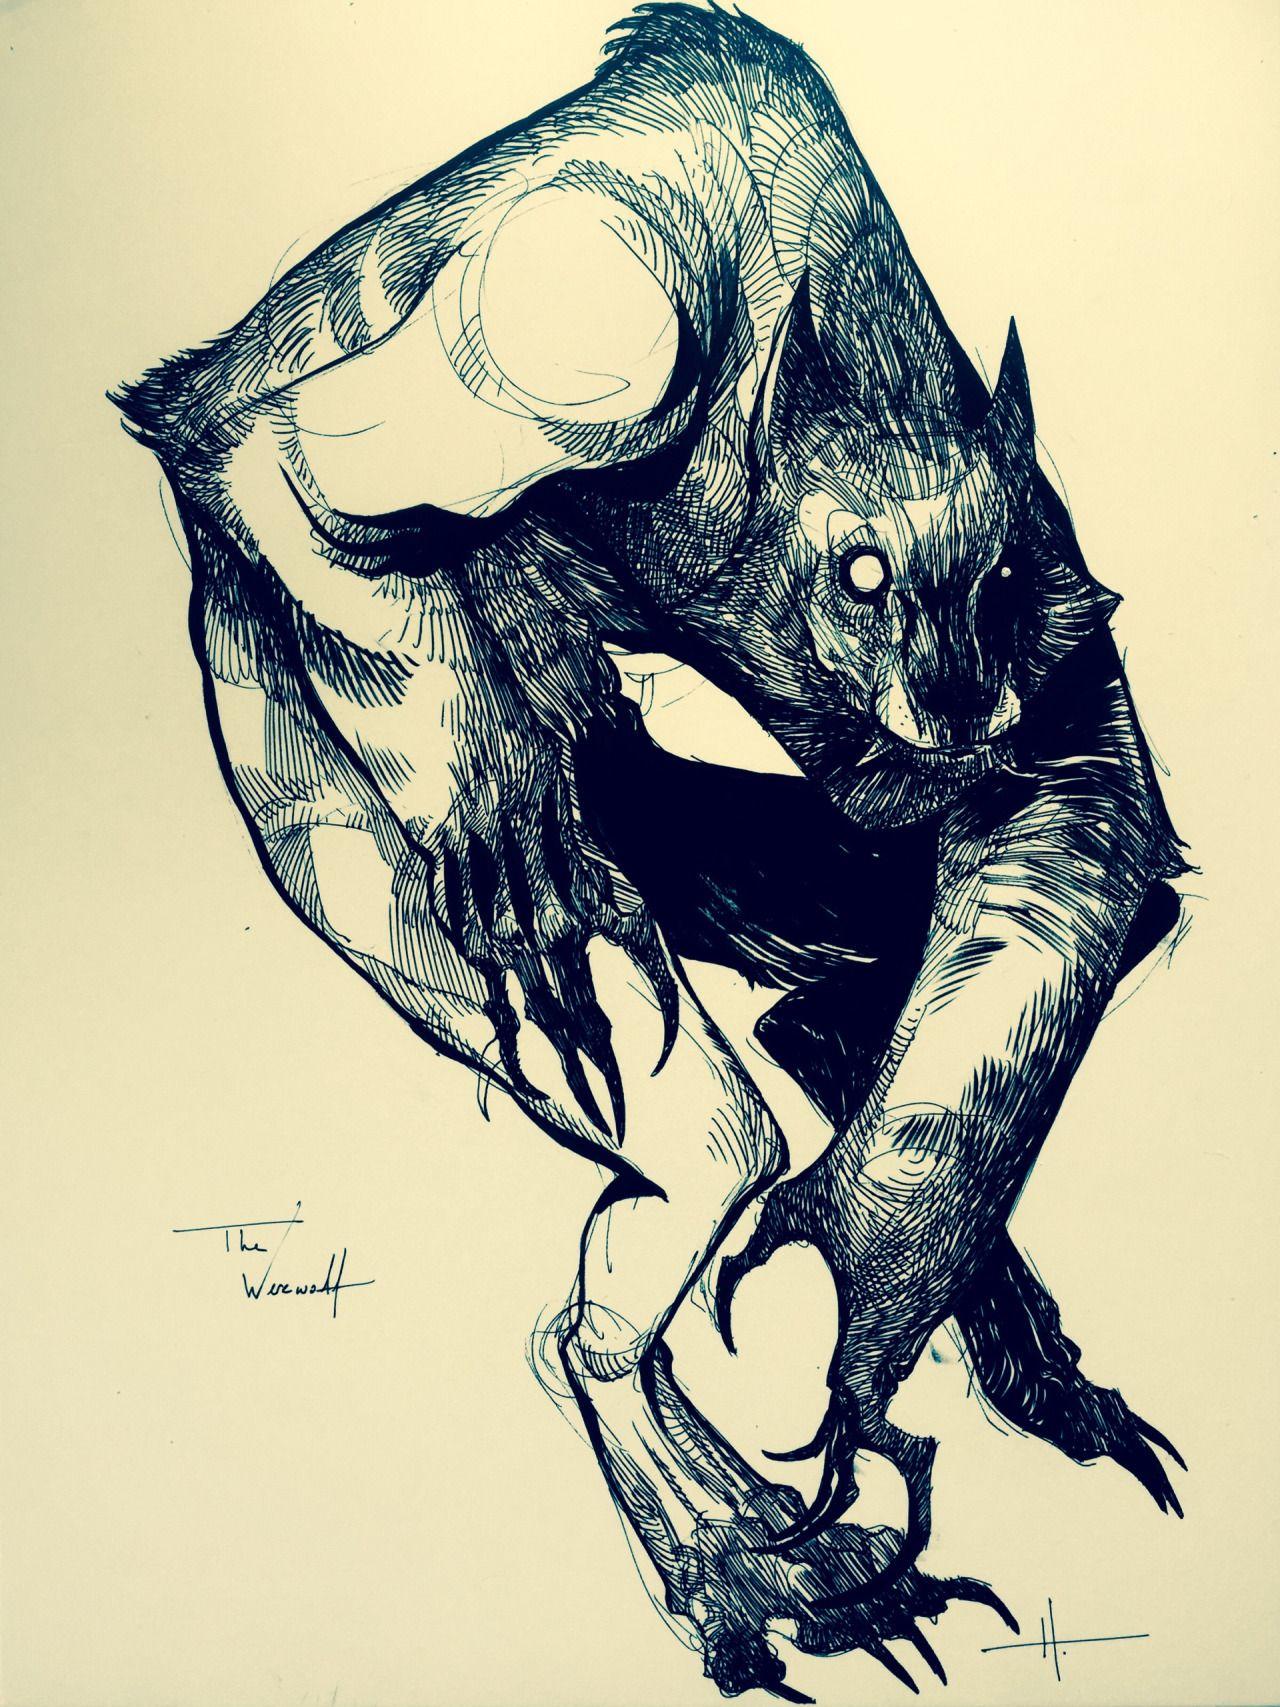 Werewolf News - Tumblr